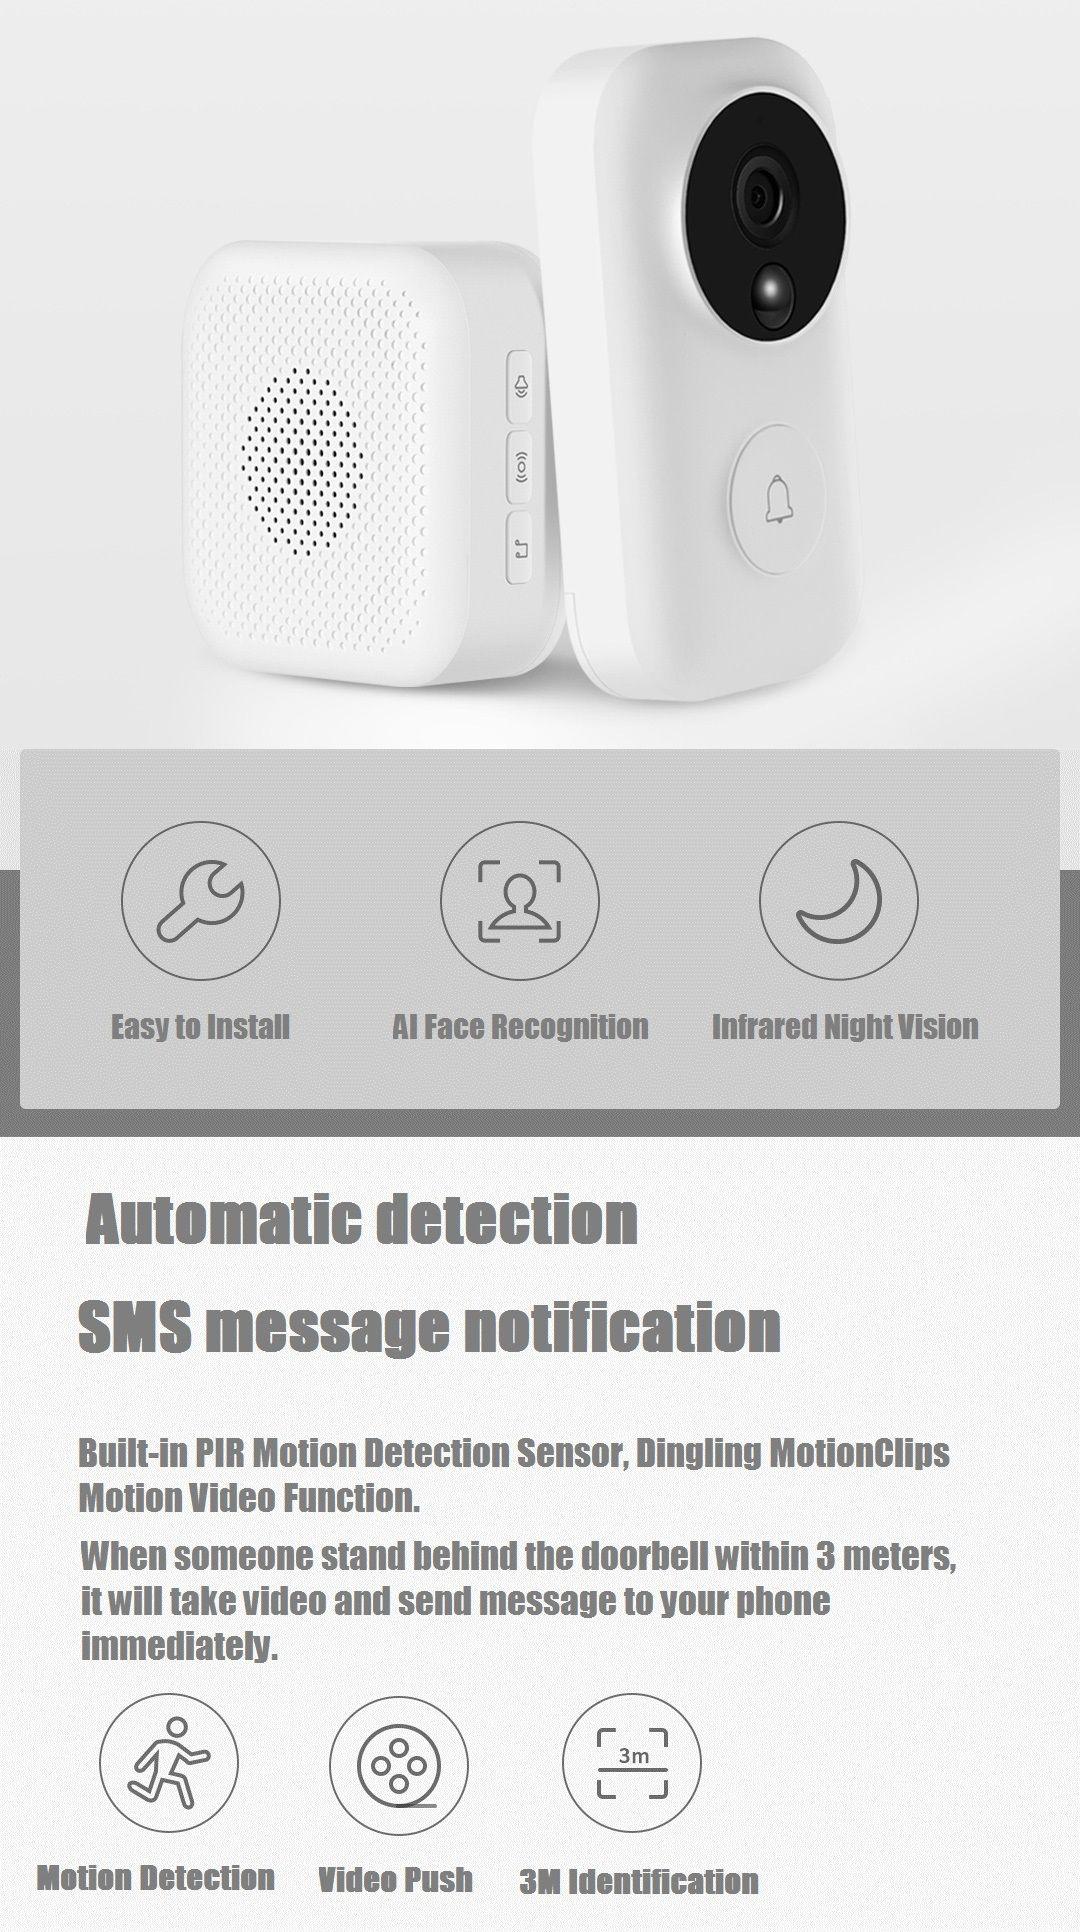 Xiaomi Zero AI Face Identification 720P IR Night Vision